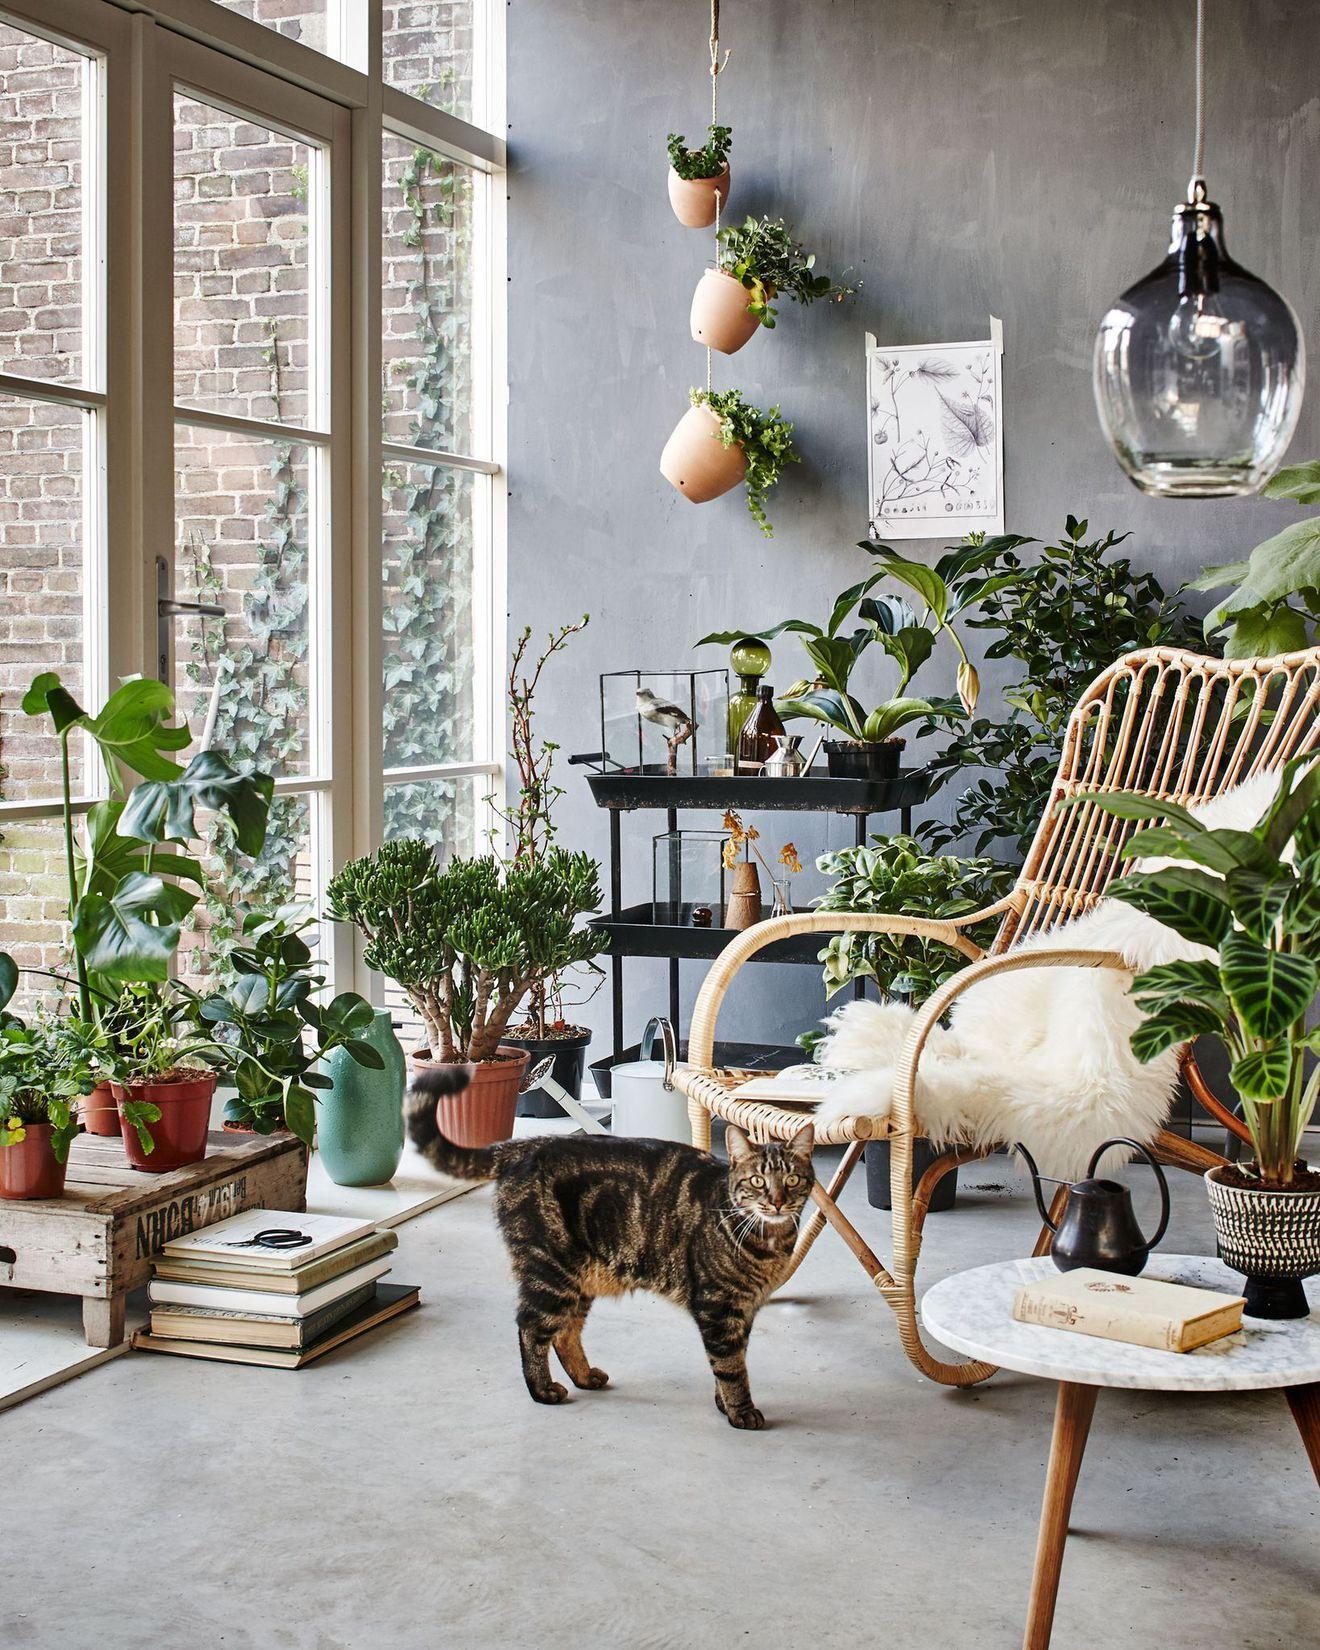 Plante suspendue : plante tombante et suspension macramé | Deco veranda, Deco, Idee deco